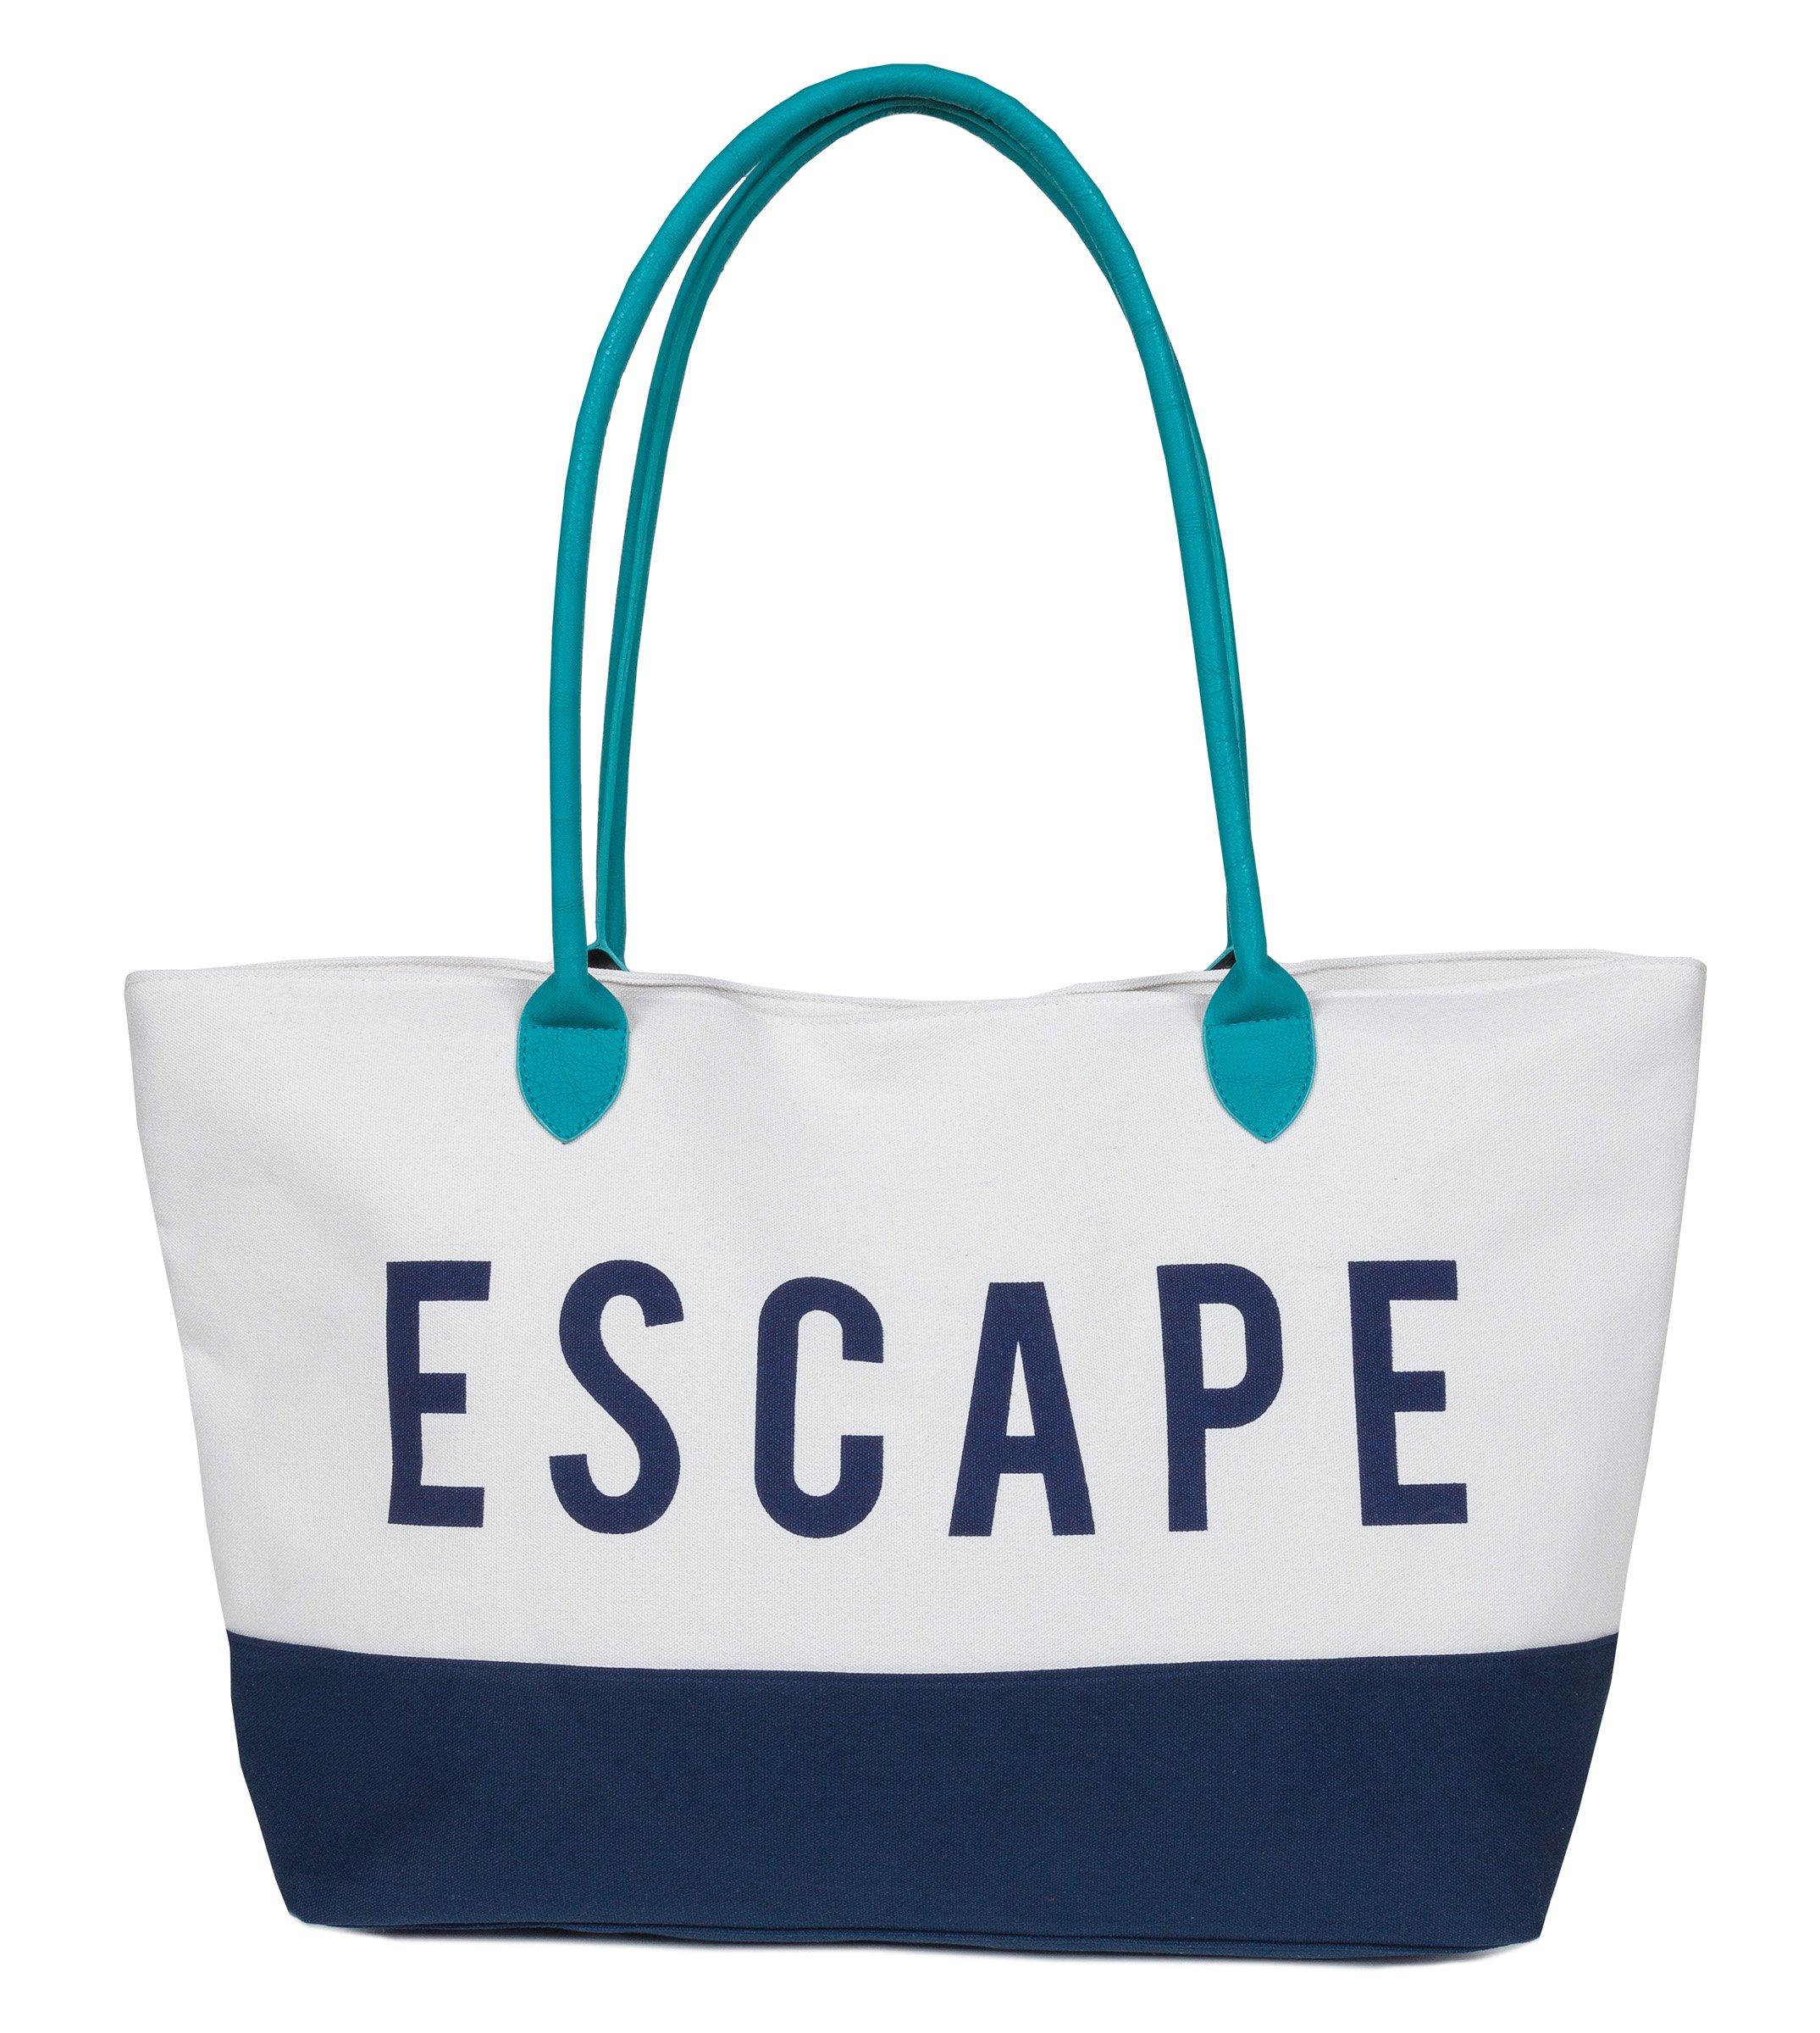 XL Large Cotton Canvas Tote Bag for Weekend Escape, Beach, Travel, Zipper Closure